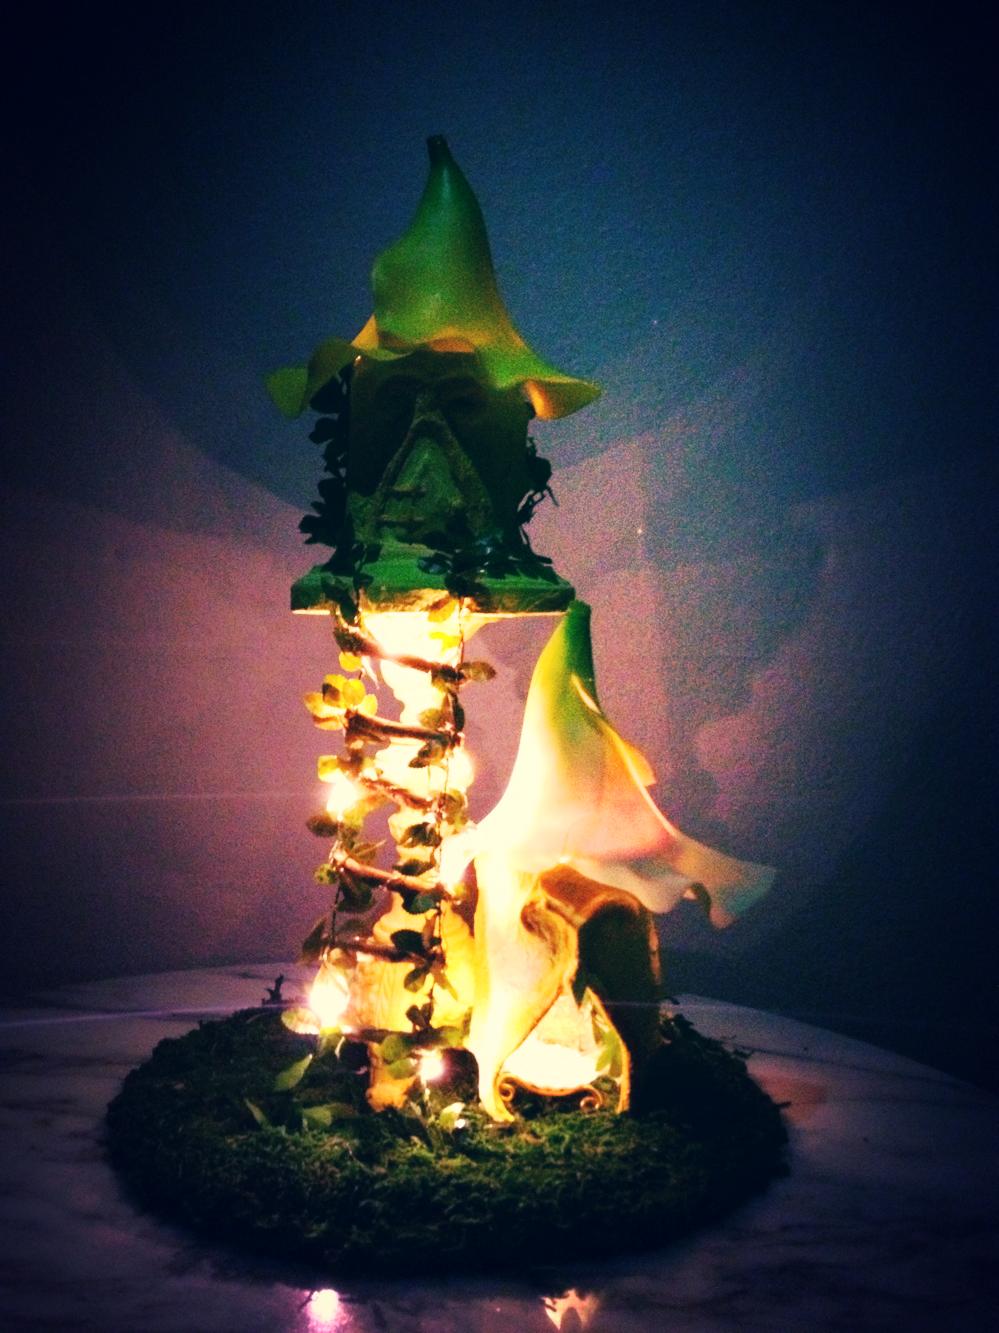 Floral flower fairy house nightlight handmade DIY